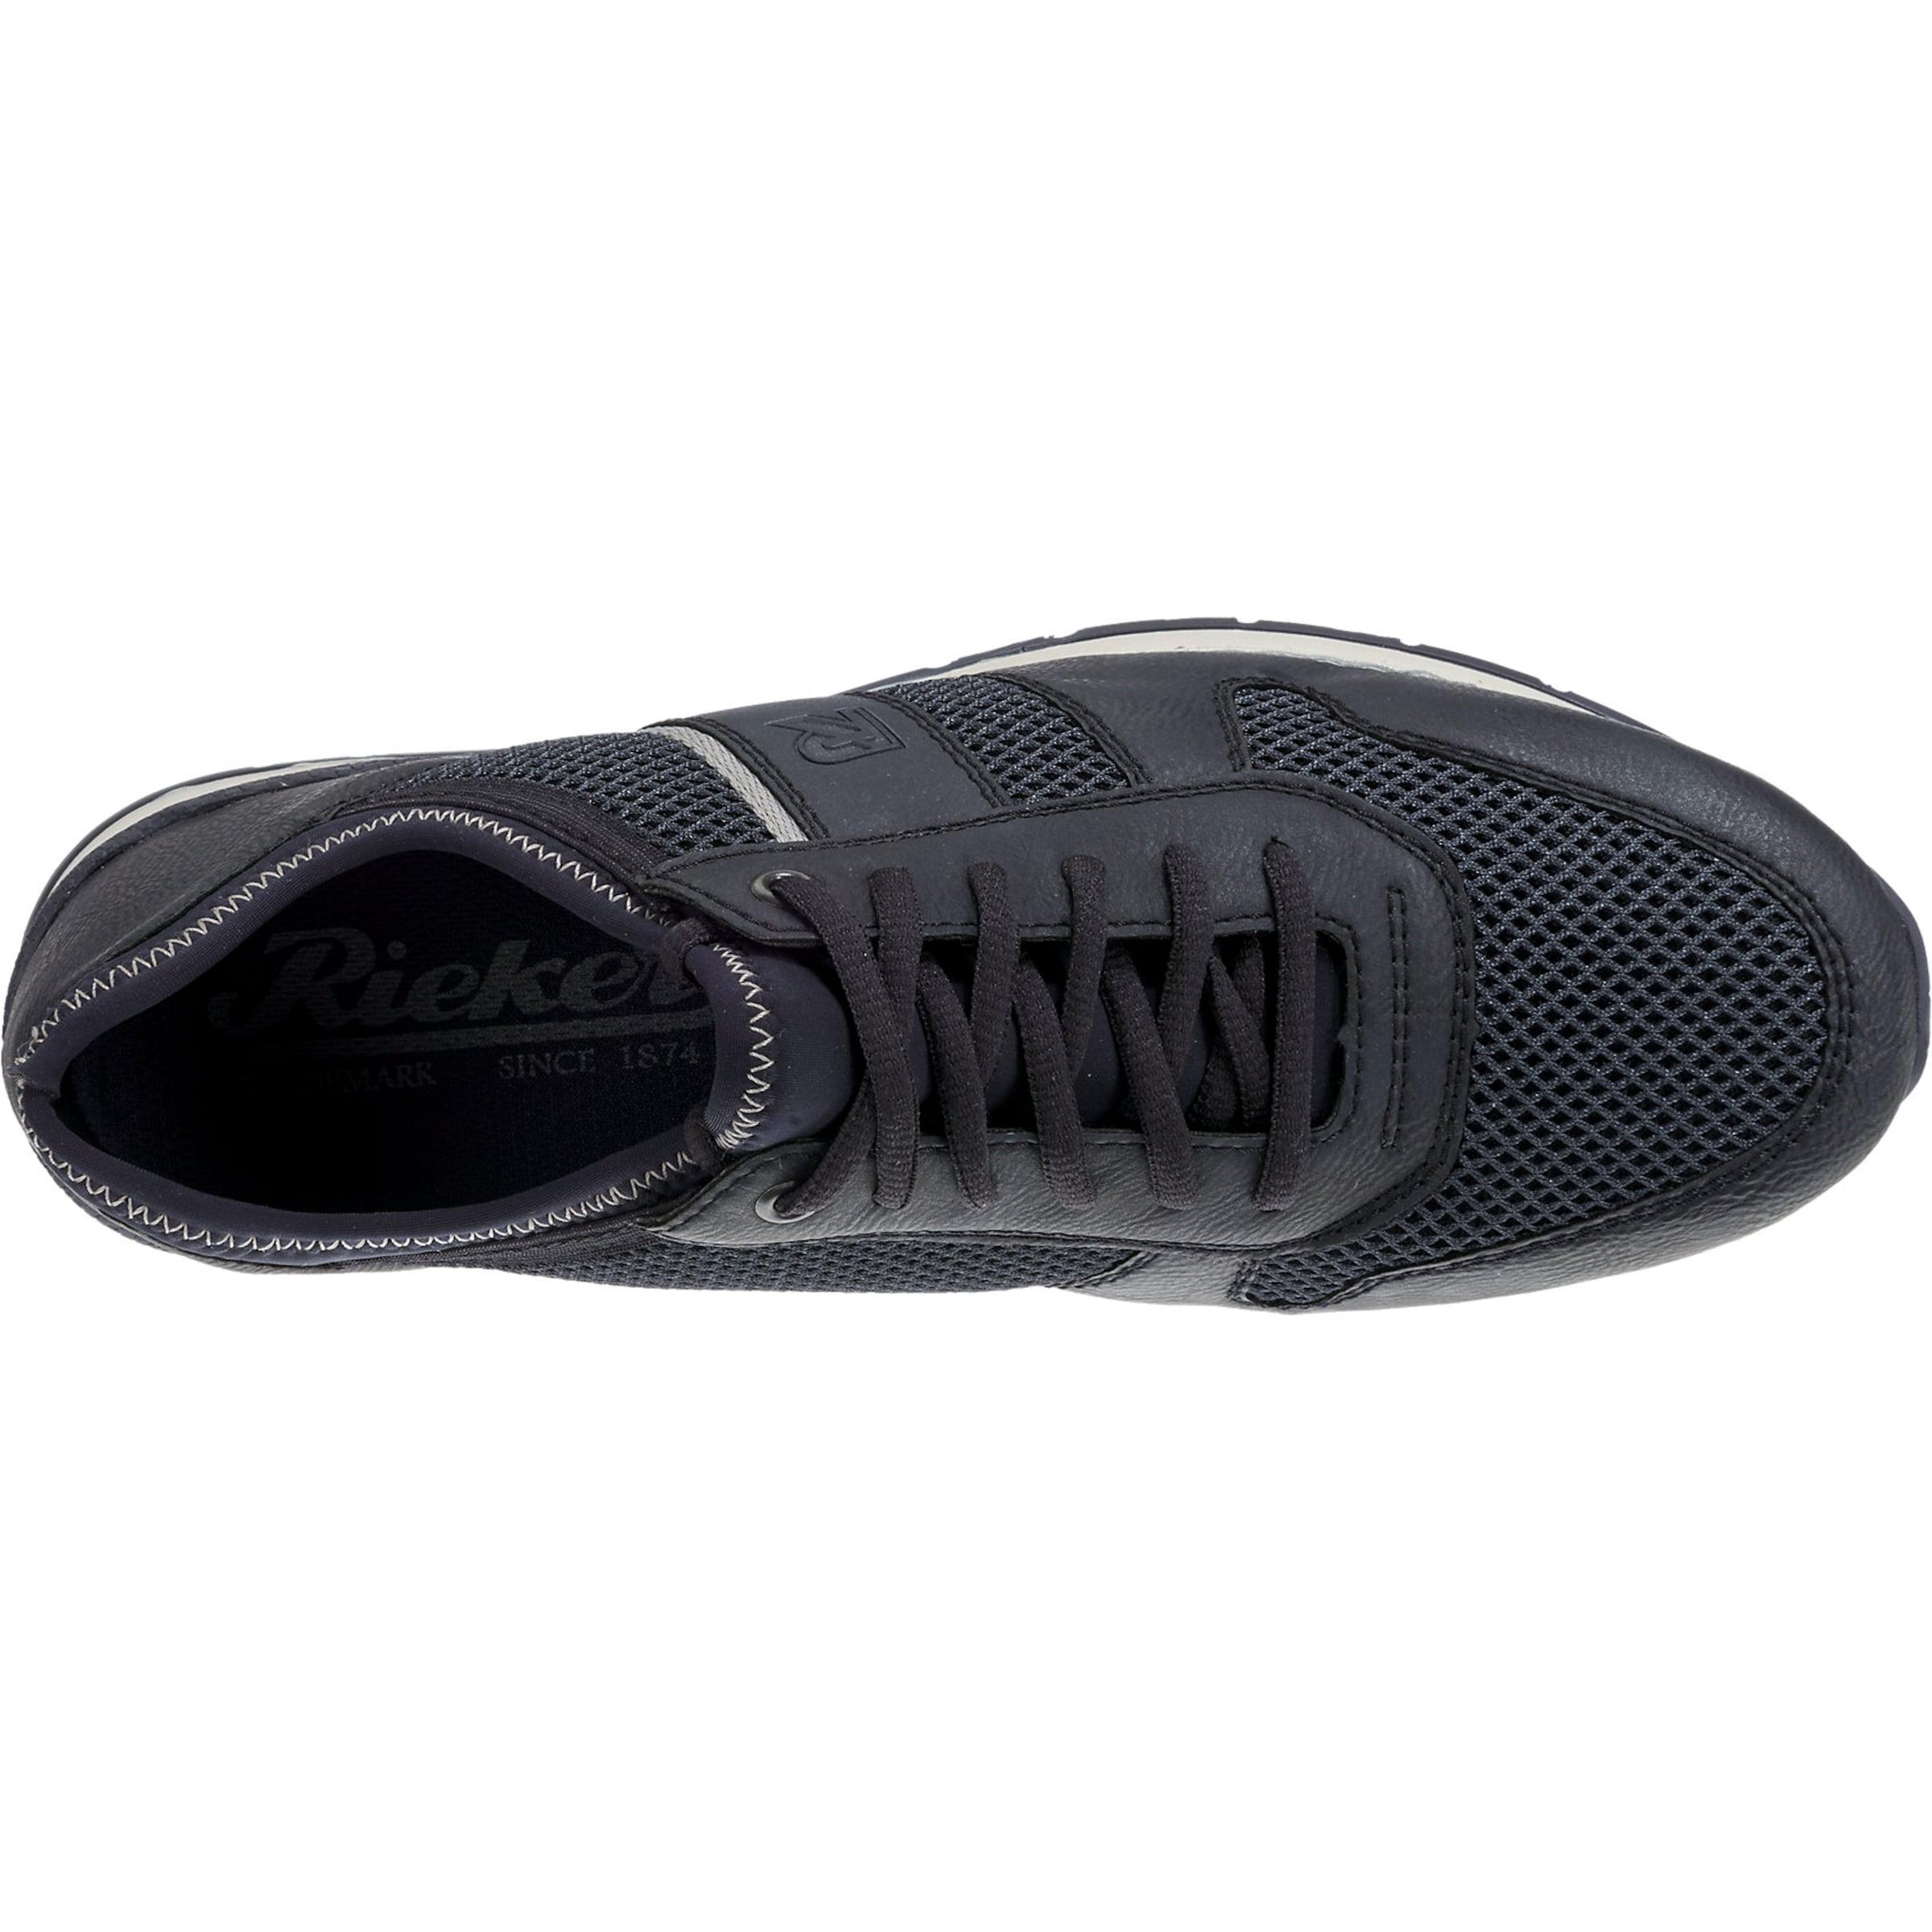 In NachtblauWeiß NachtblauWeiß Rieker Rieker Sneaker Sneaker Sneaker Sneaker Rieker In In In Rieker NachtblauWeiß 8O0kNnZPXw